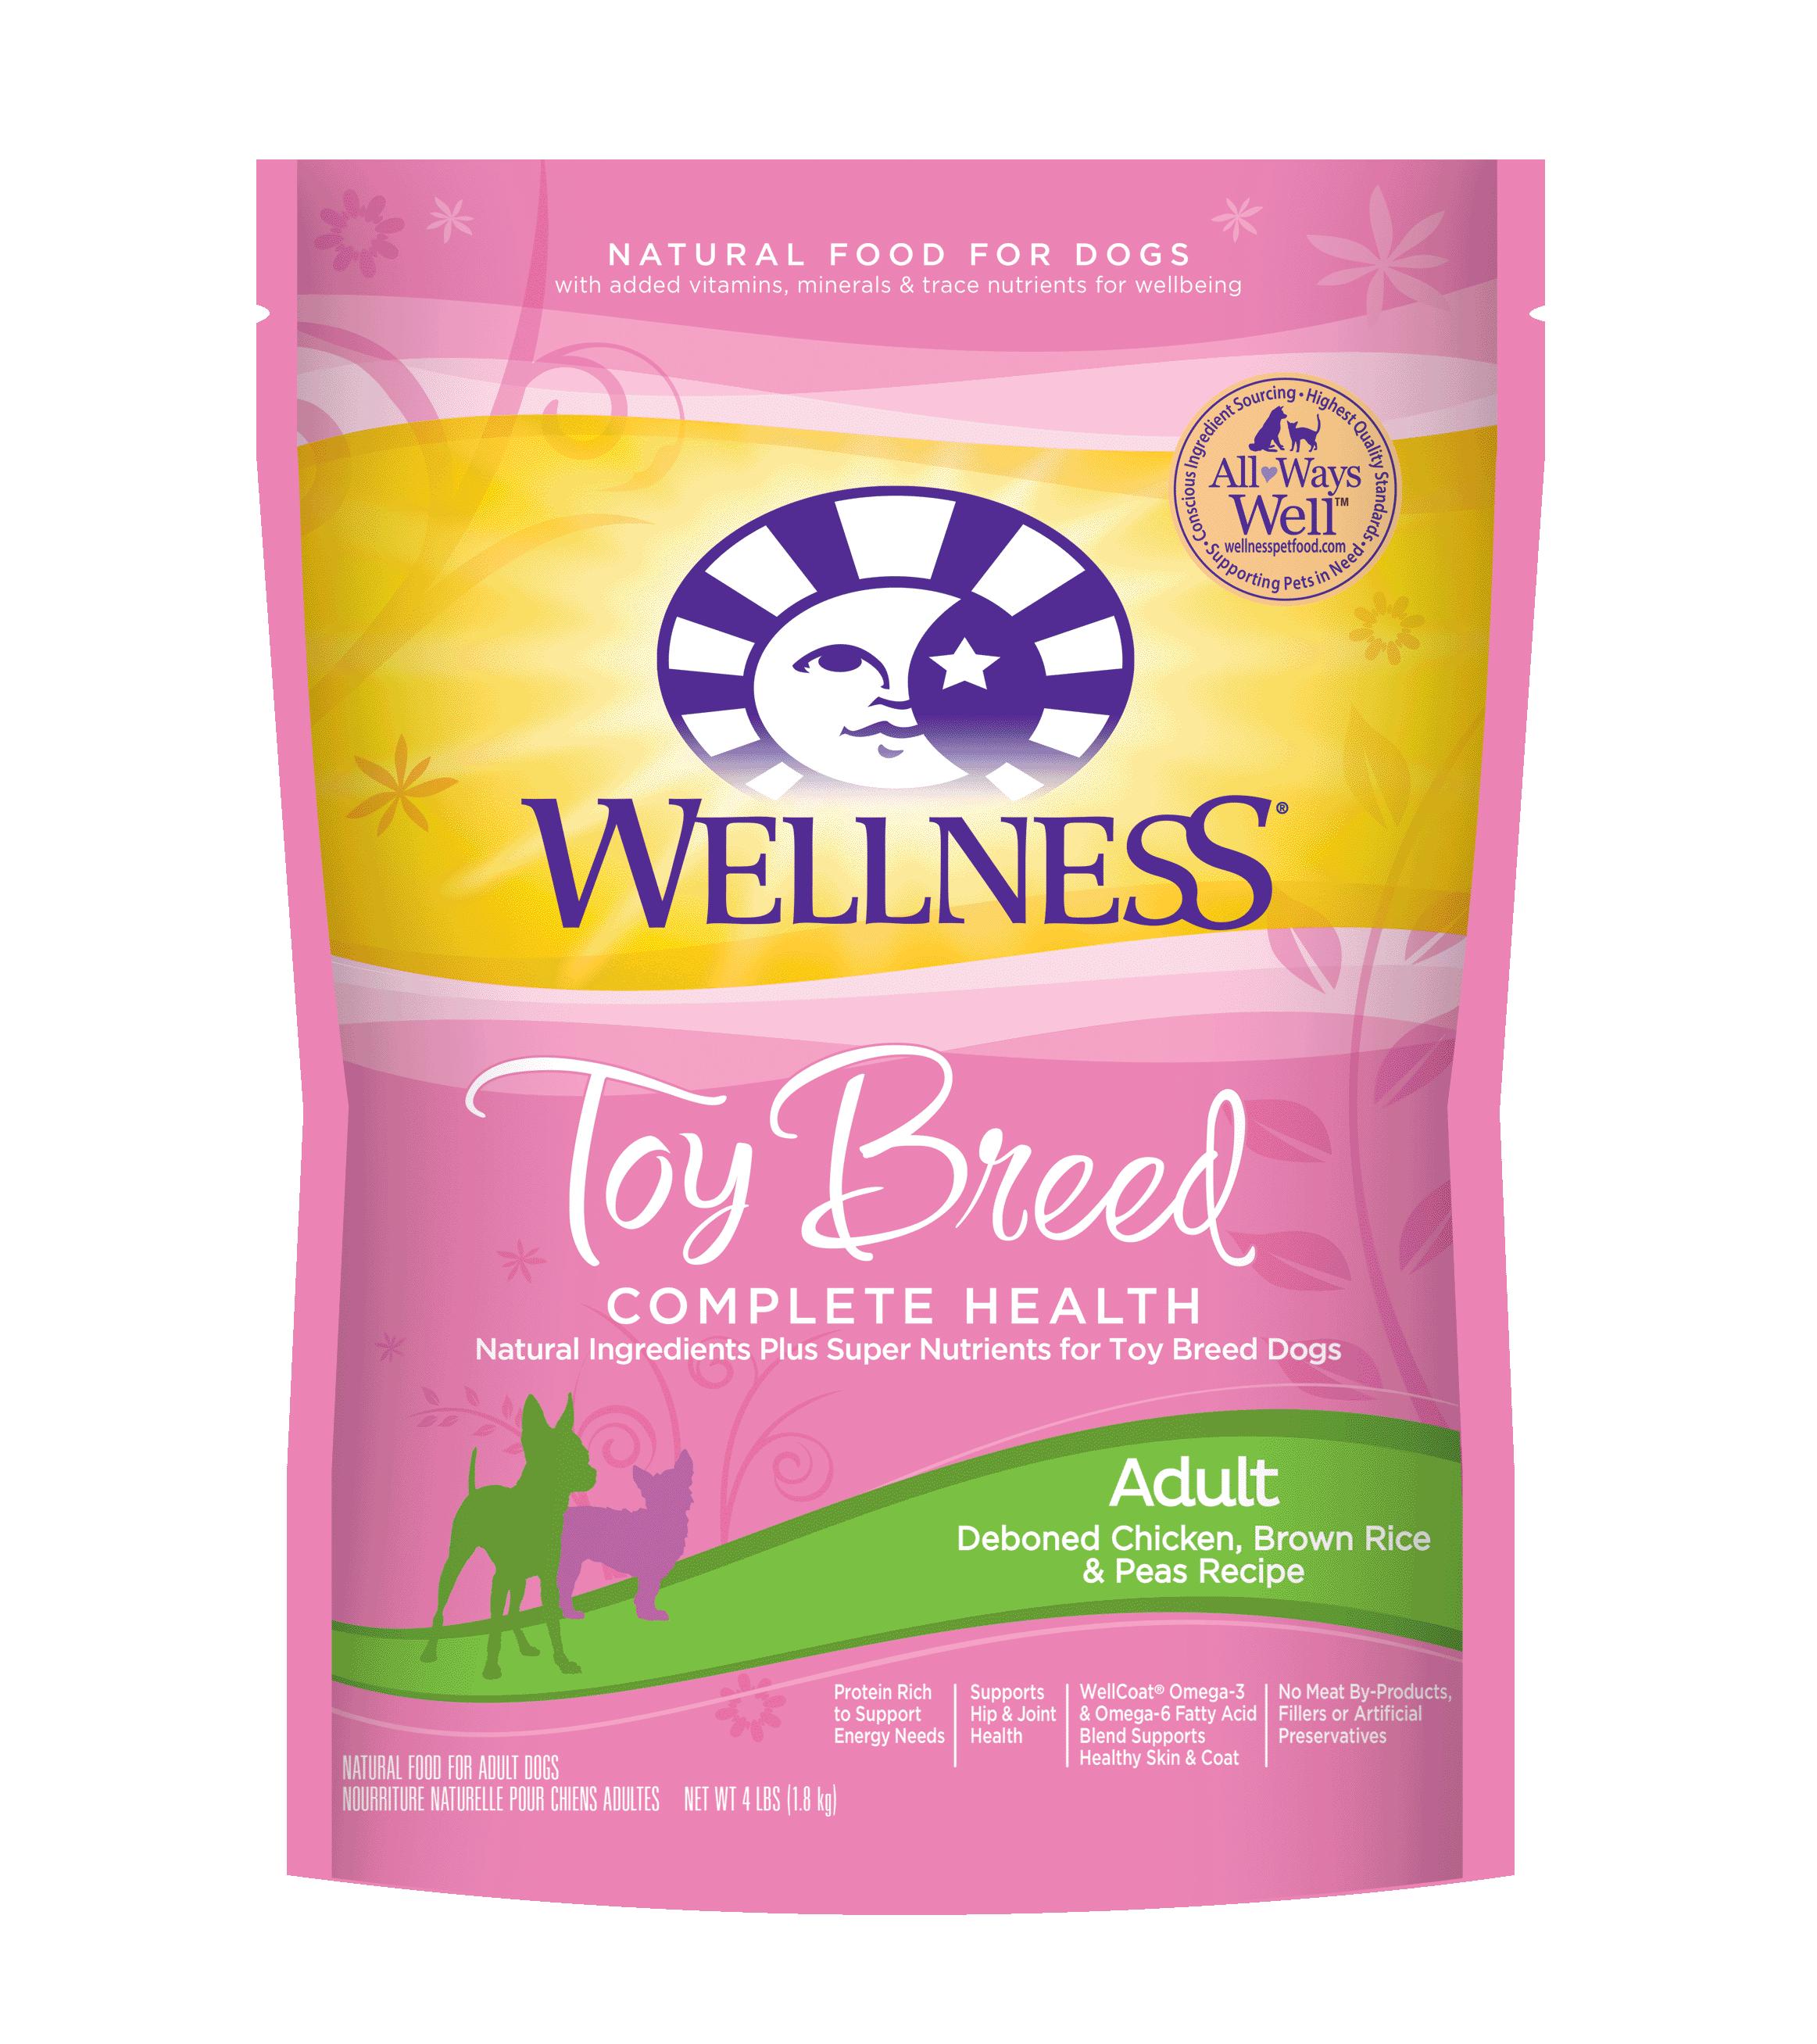 Toy Breed Complete Health Adult Deboned Chicken Brown